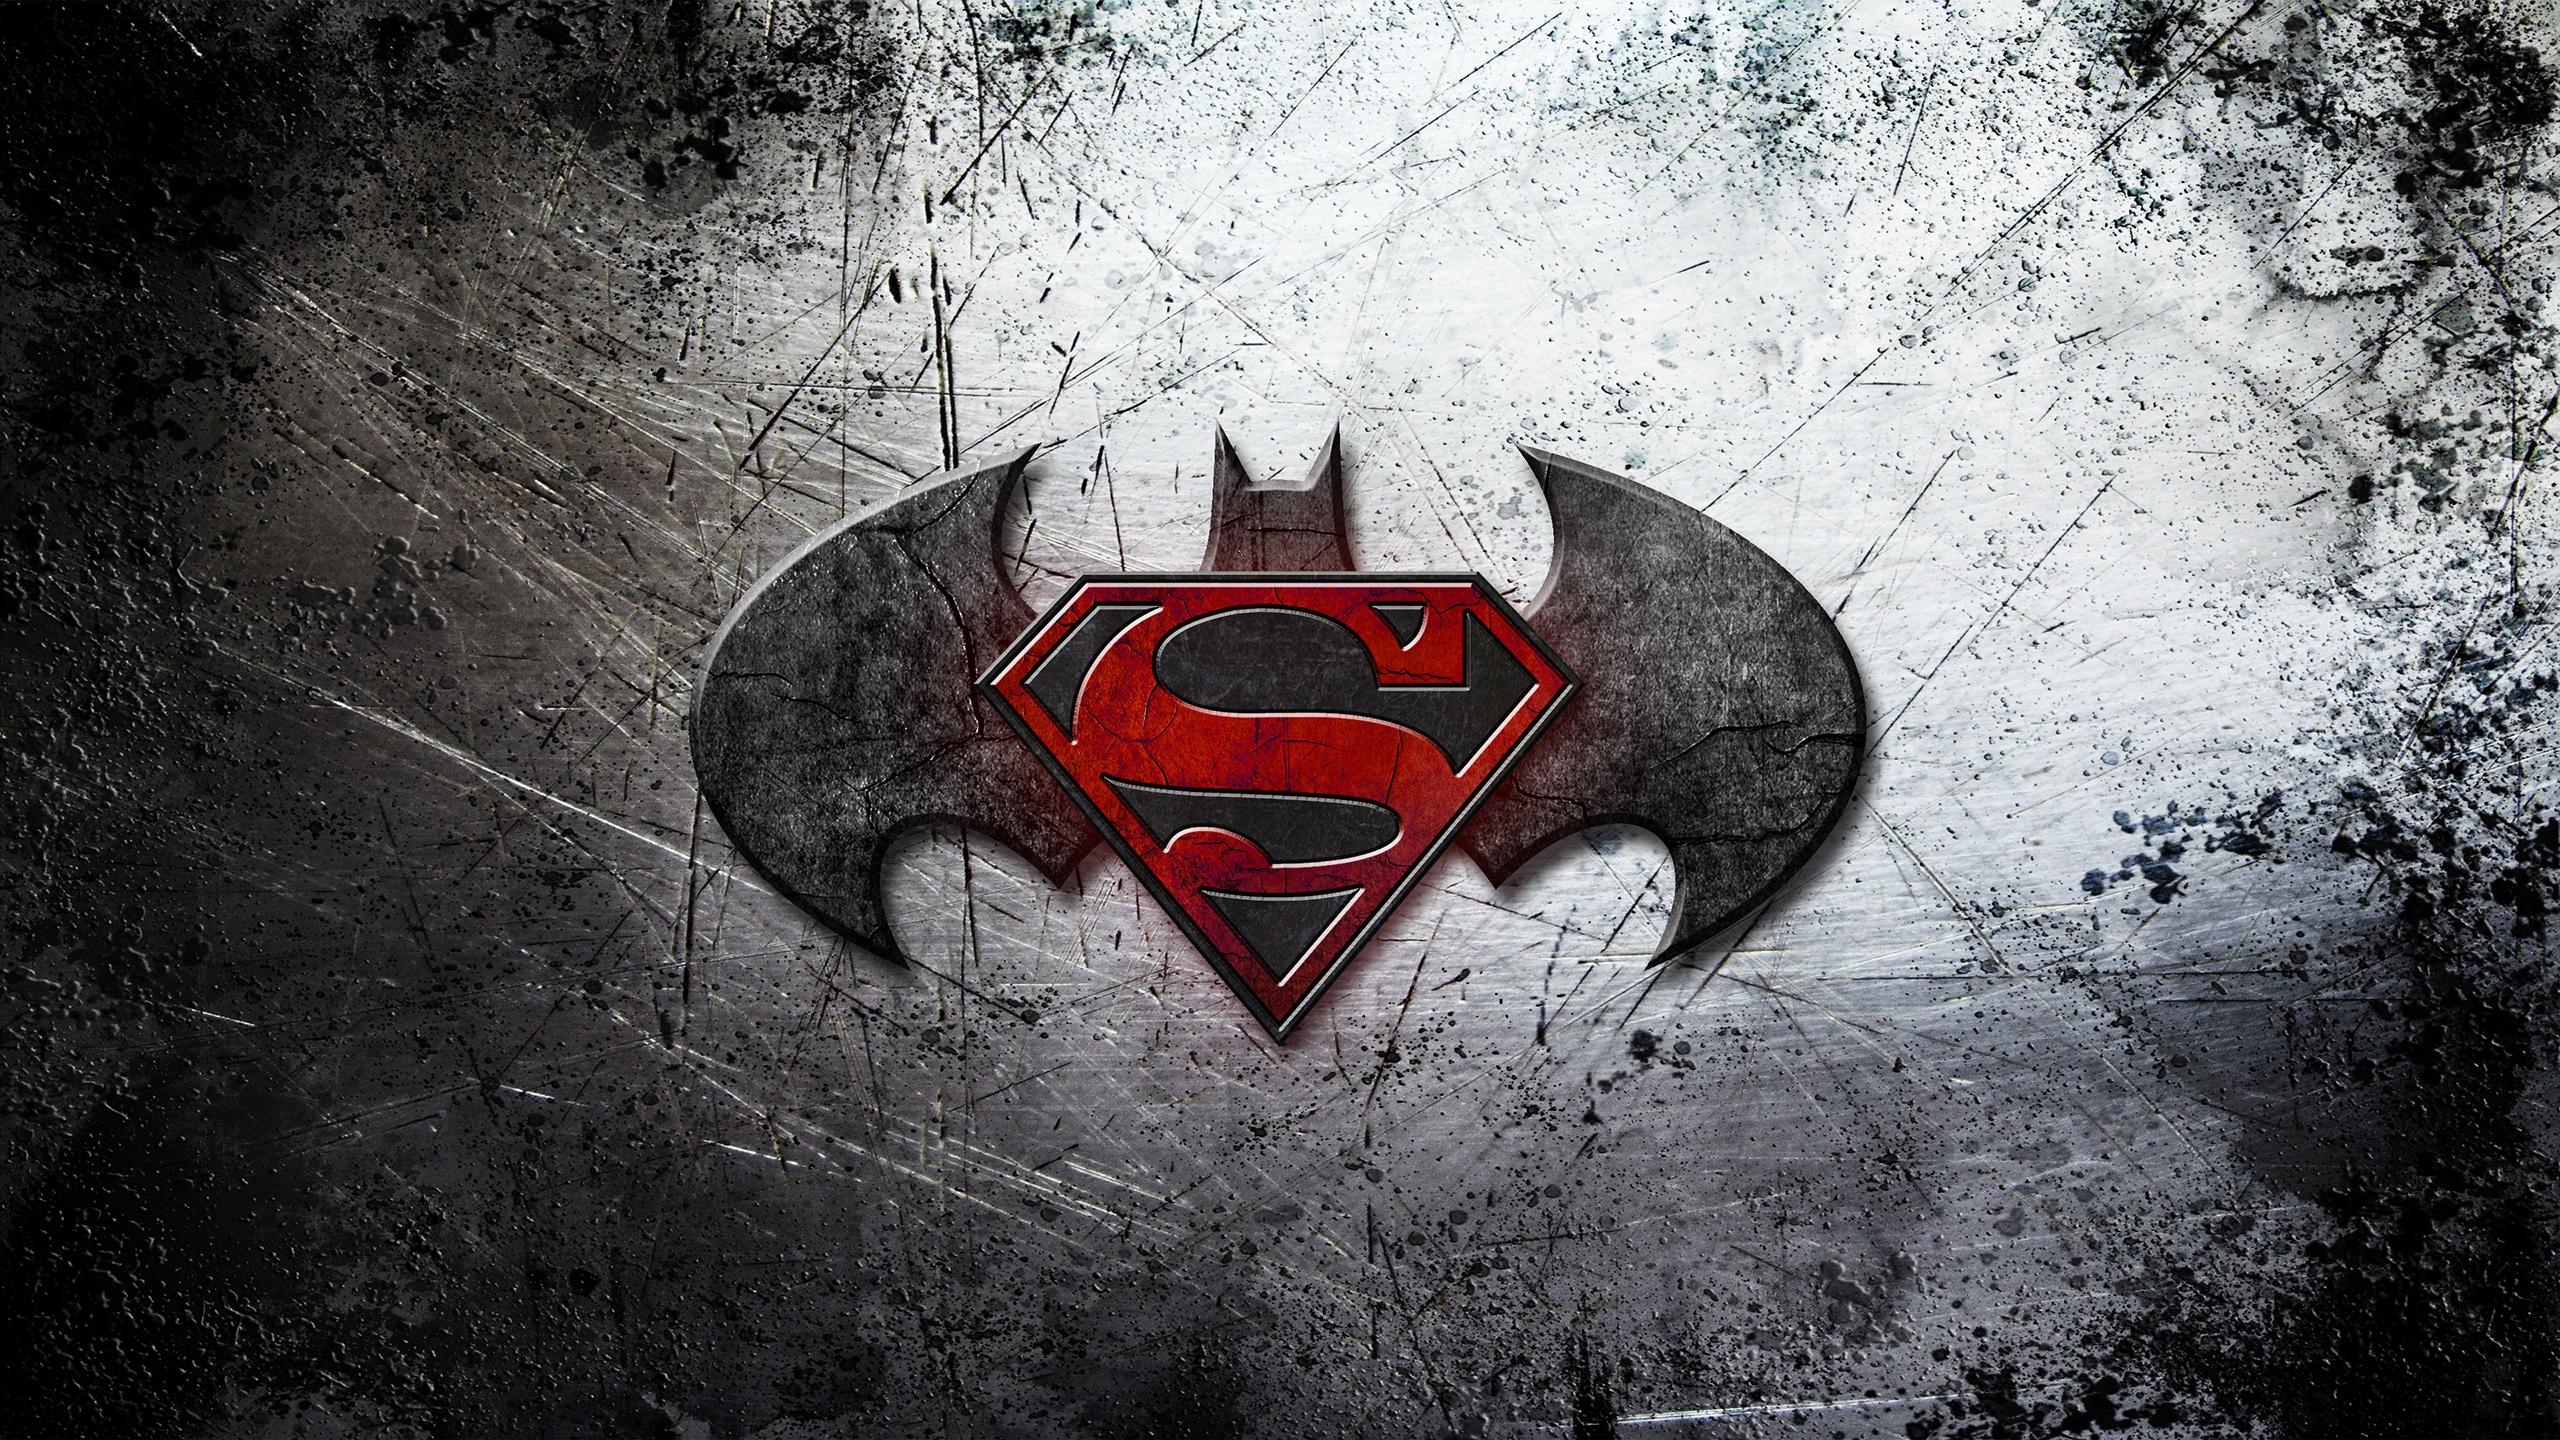 Hd wallpaper batman - Batman Vs Superman Logo Wallpaper In High Resolution At Movies